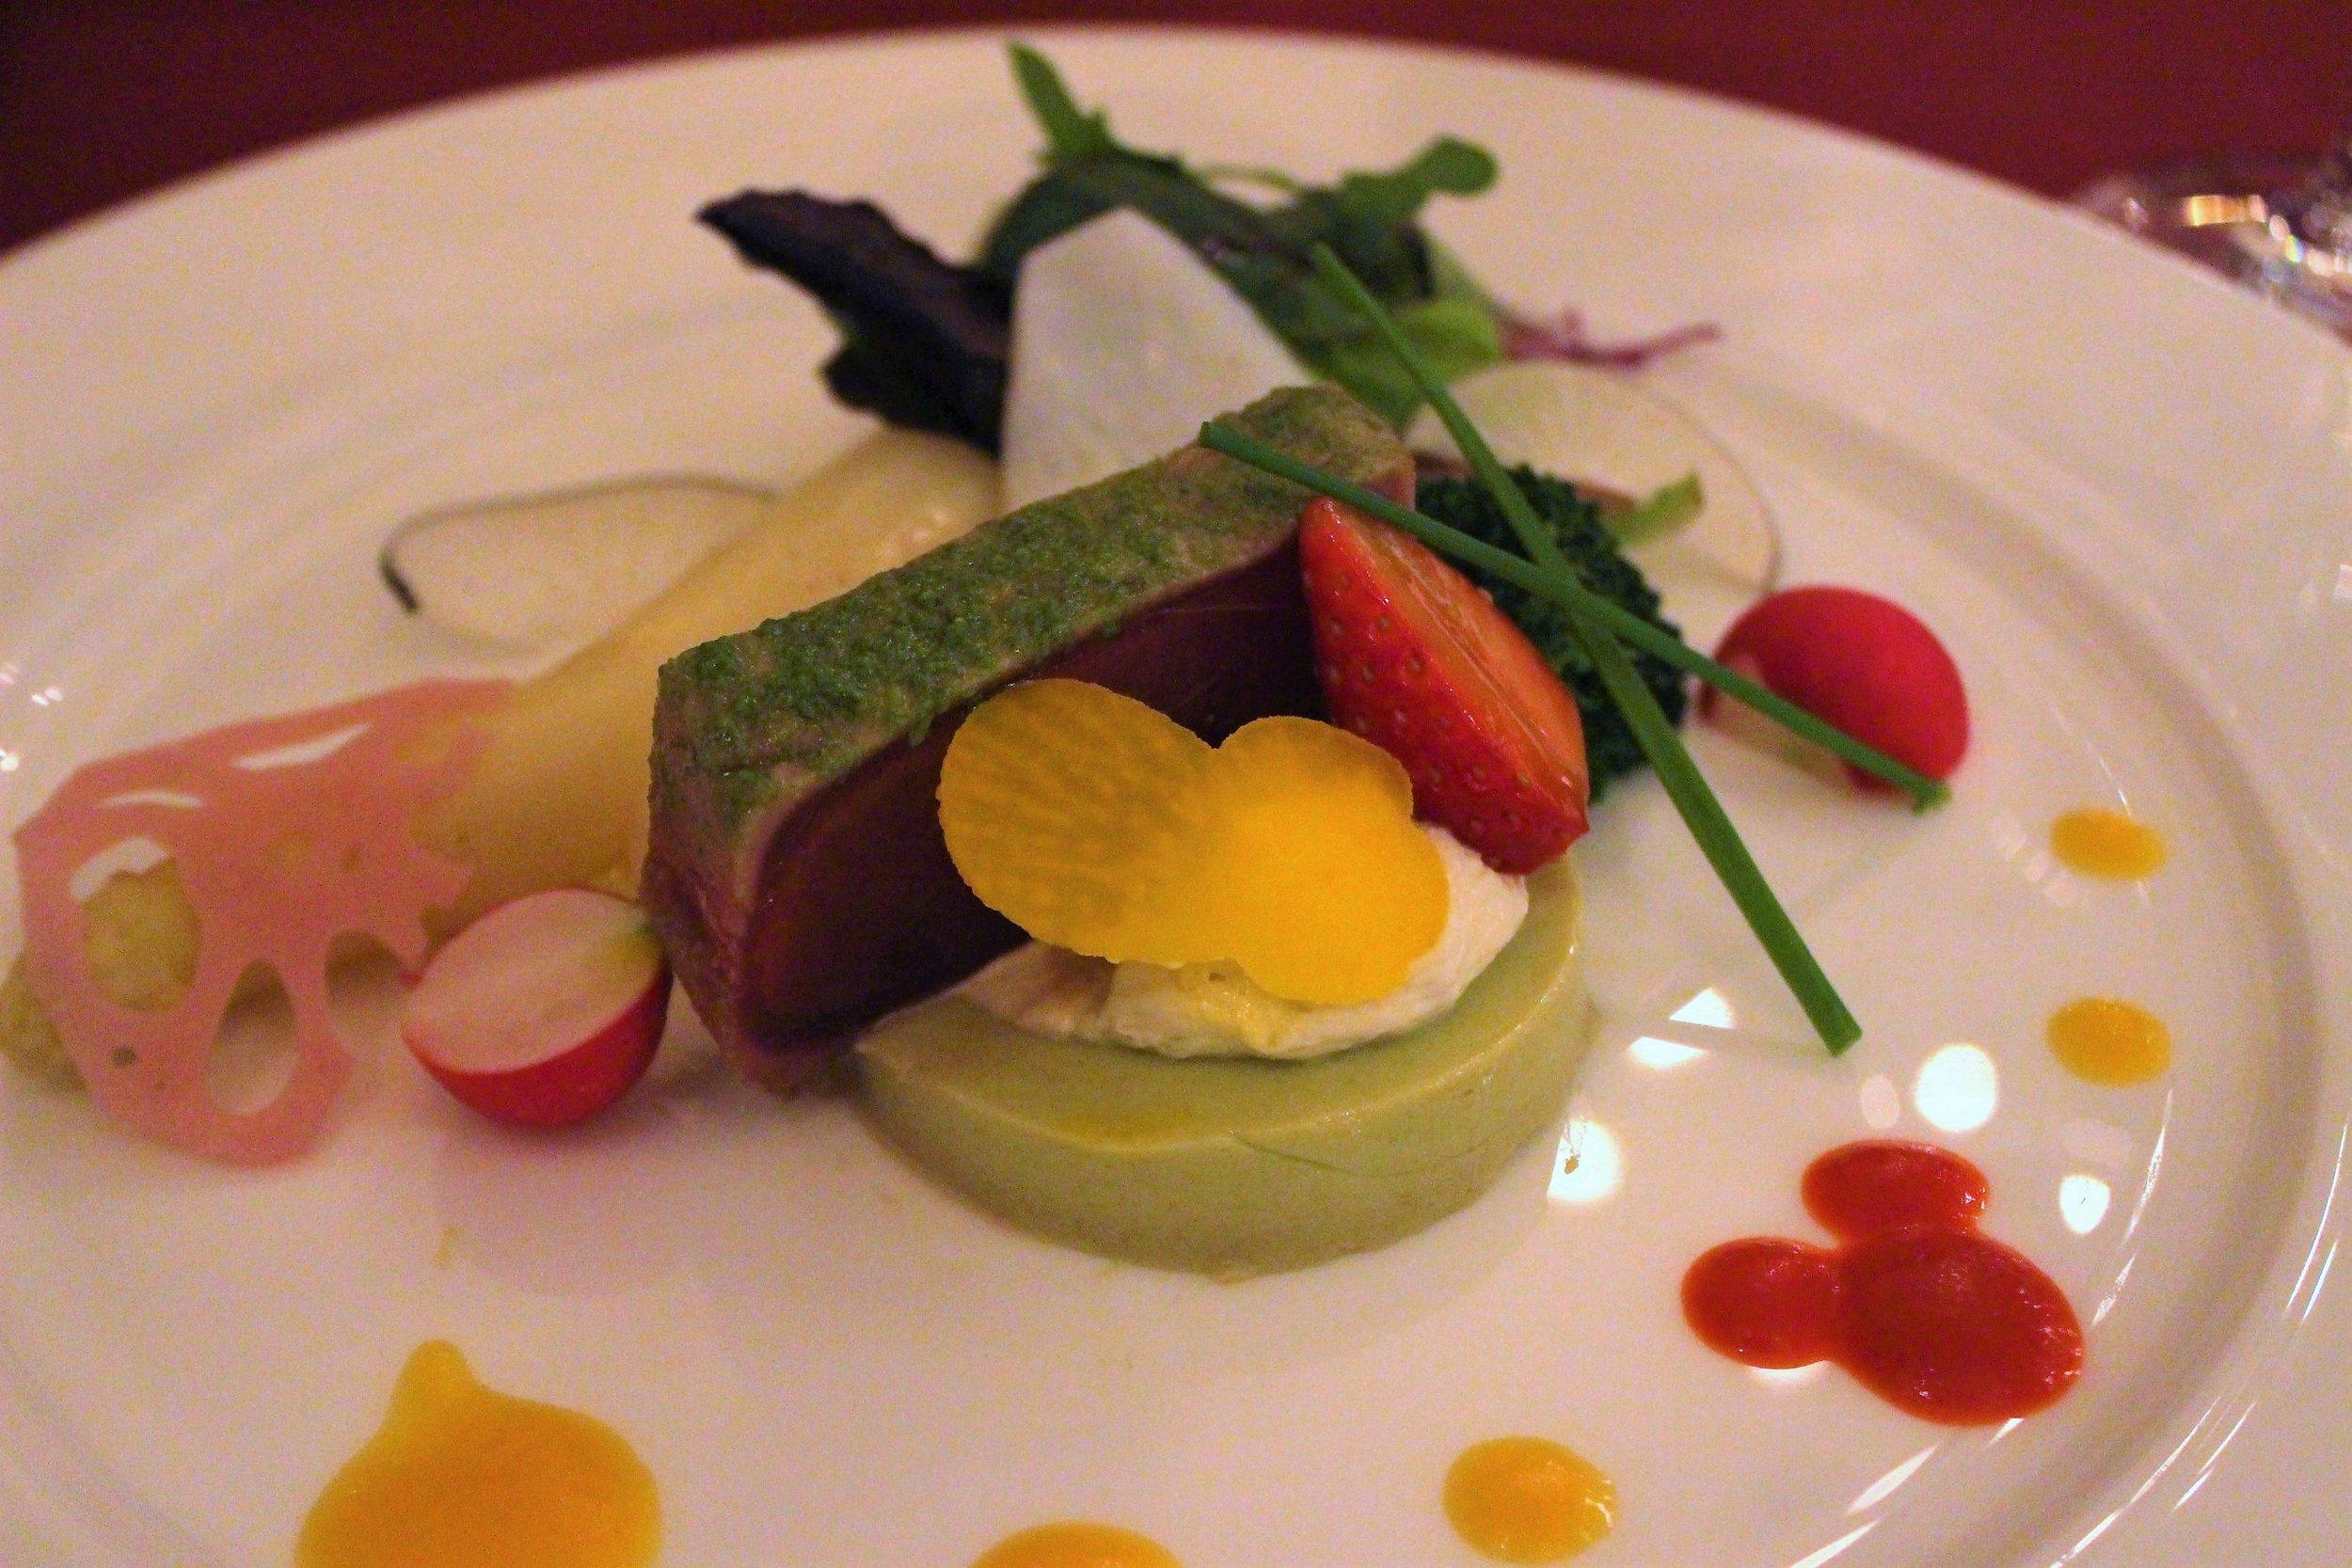 Marinated Tuna with Avocado Mousse at Magellan's in DisneySea, Tokyo, Japan